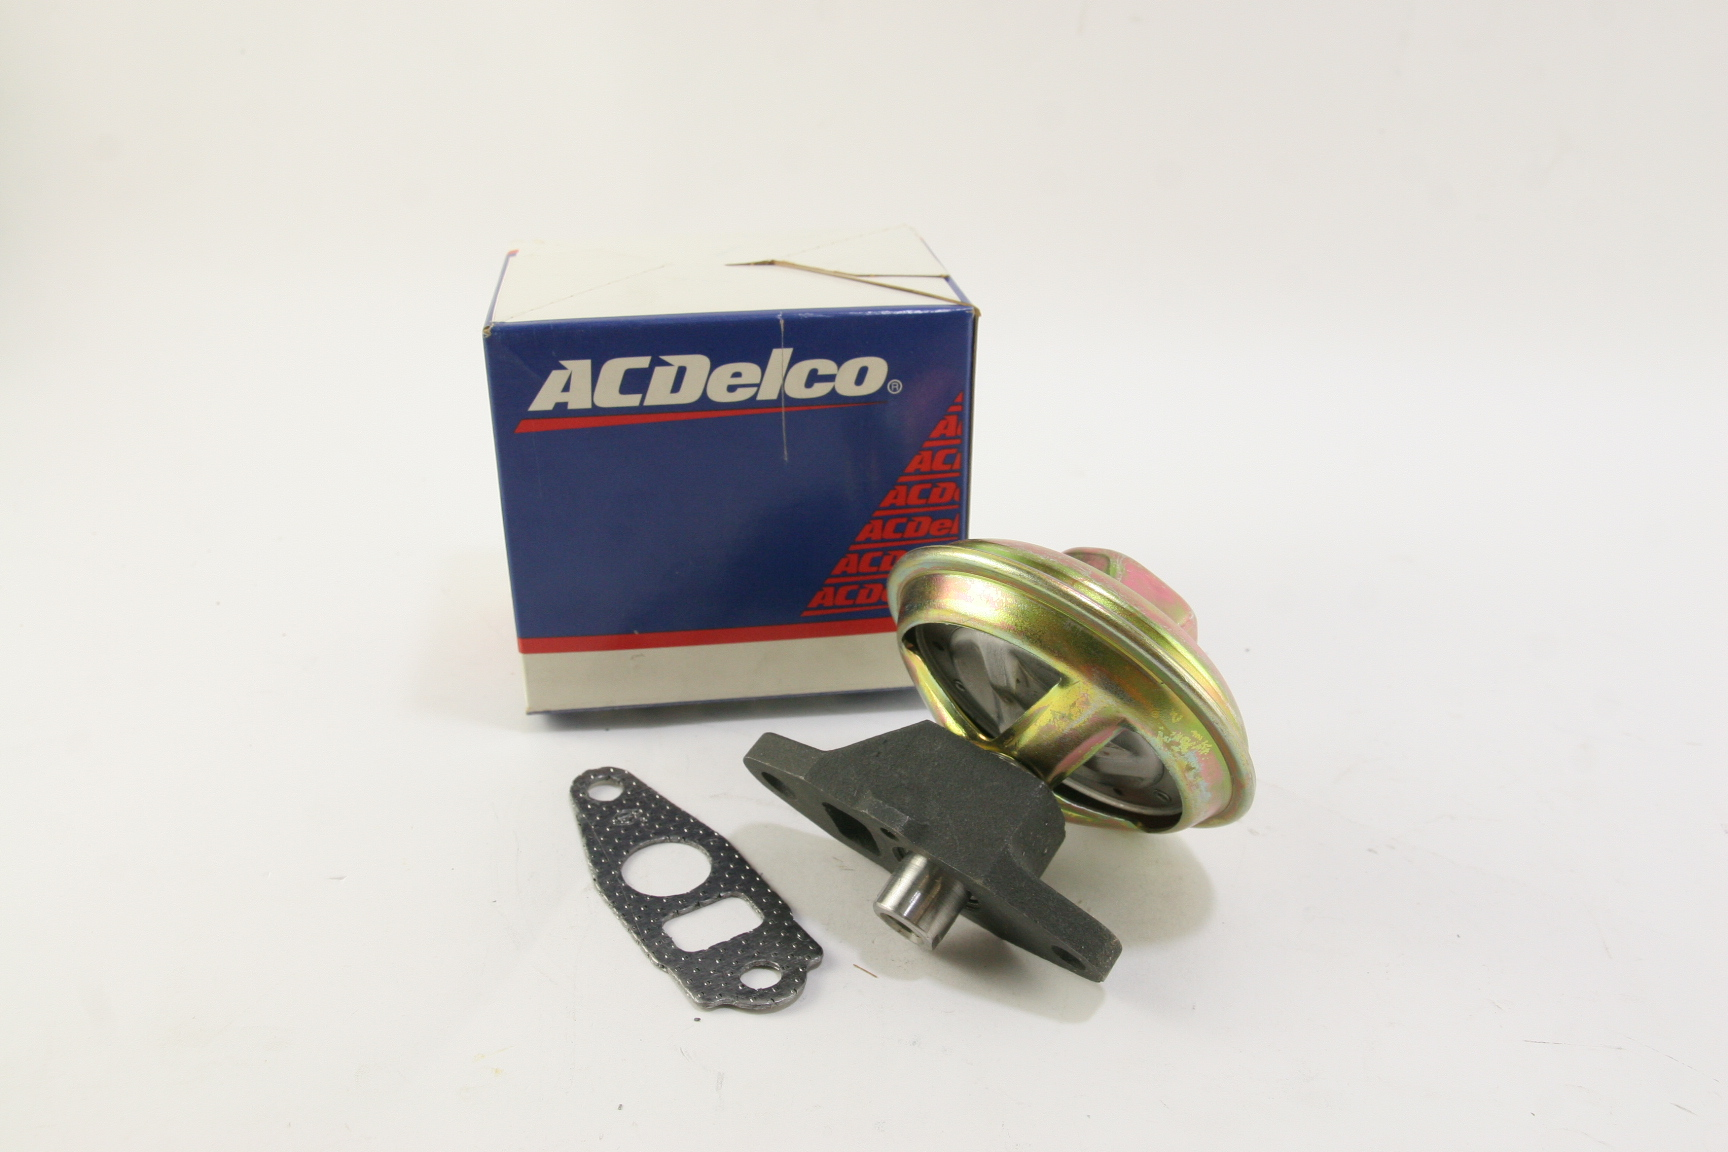 NEW ACDelco OEM 214-5557 EGR Valve 17113478 Free Shipping NIP - image 1